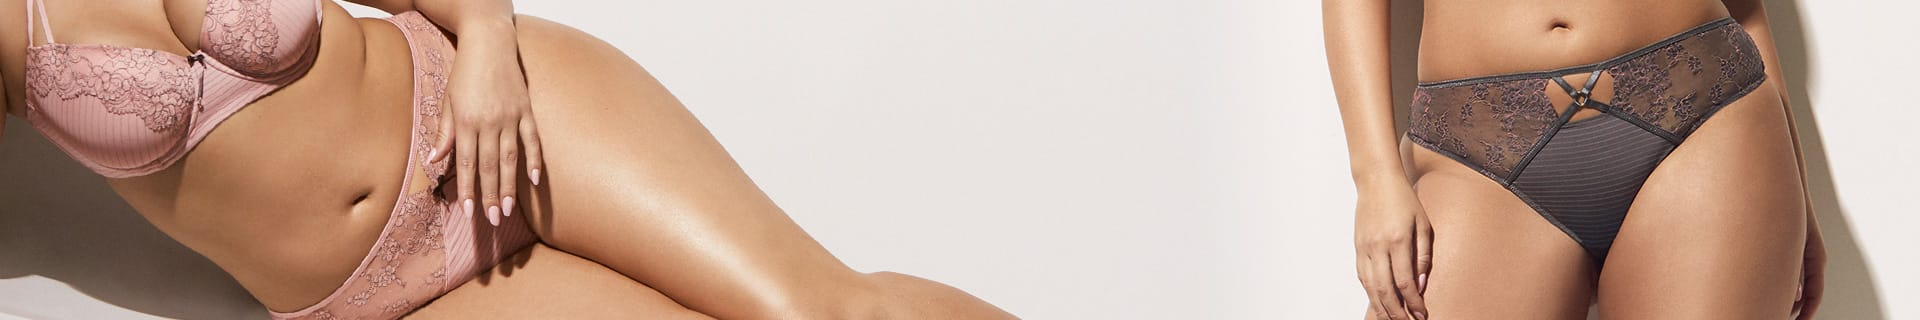 Culottes Ashley Graham